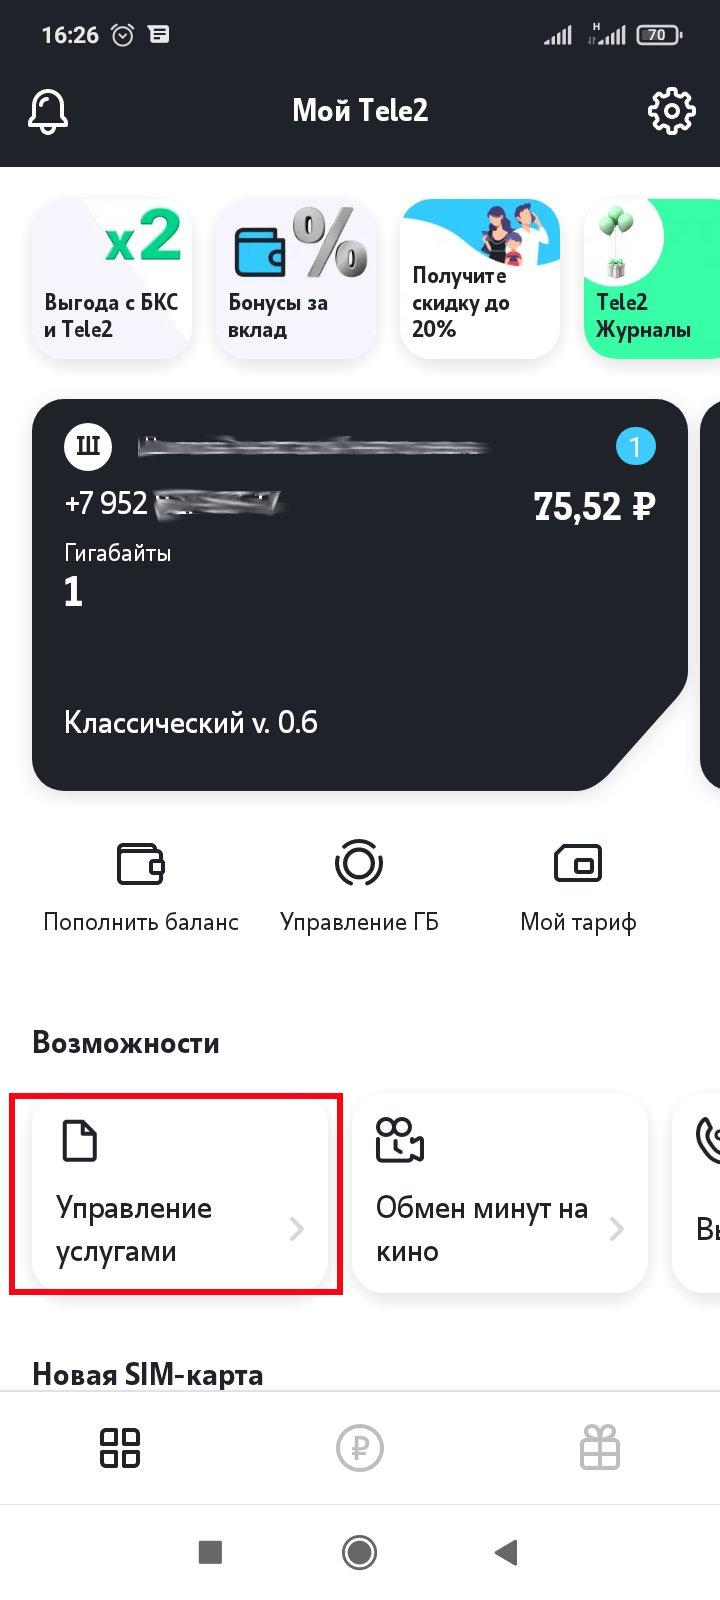 Вход в приложение Теле2